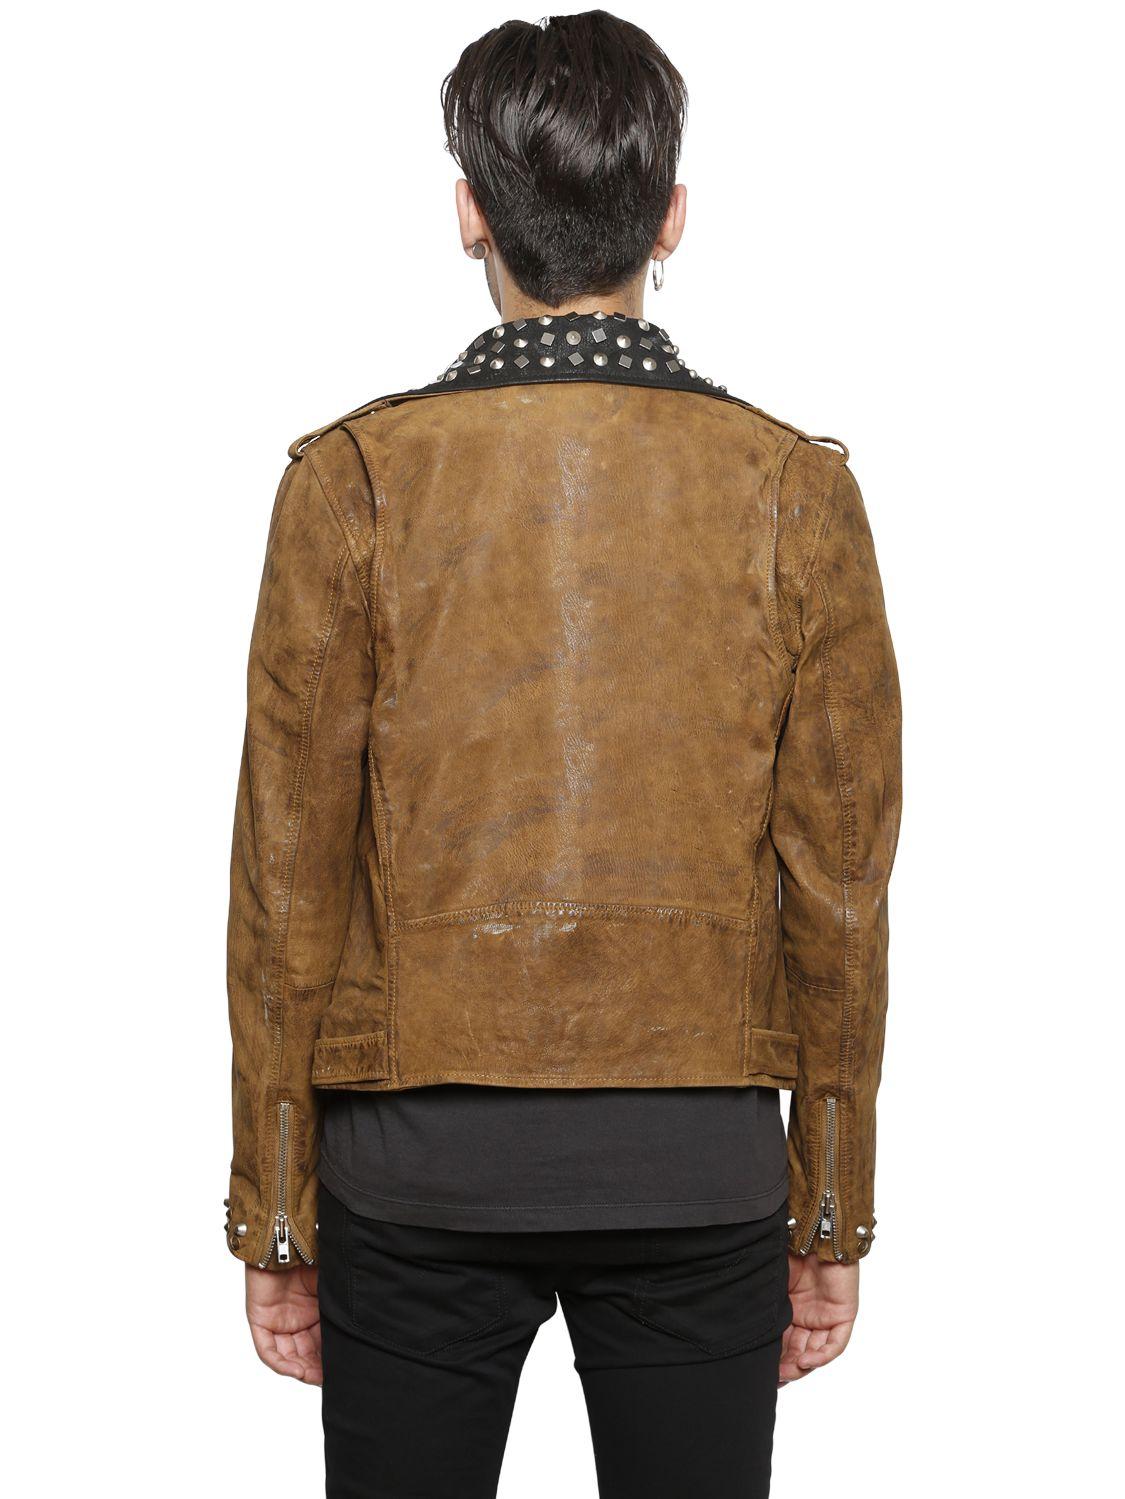 Diesel Studded Vintage Leather Moto Jacket In Brown For Men Lyst